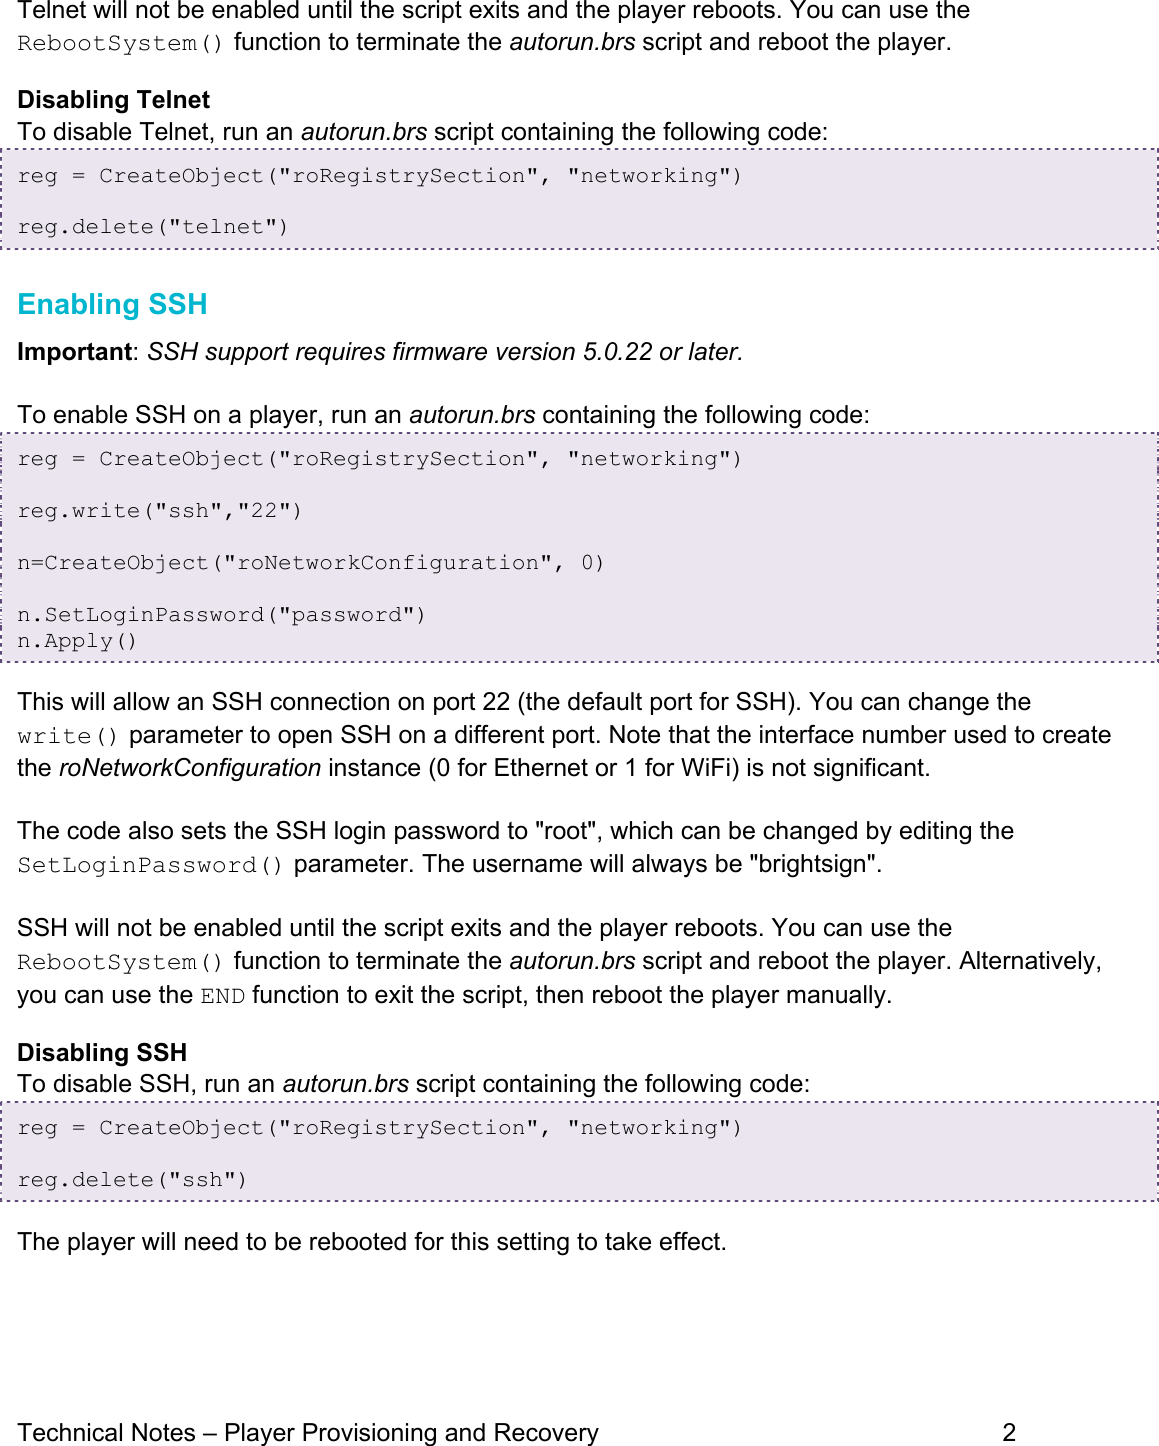 Enabling Telnet And SSH